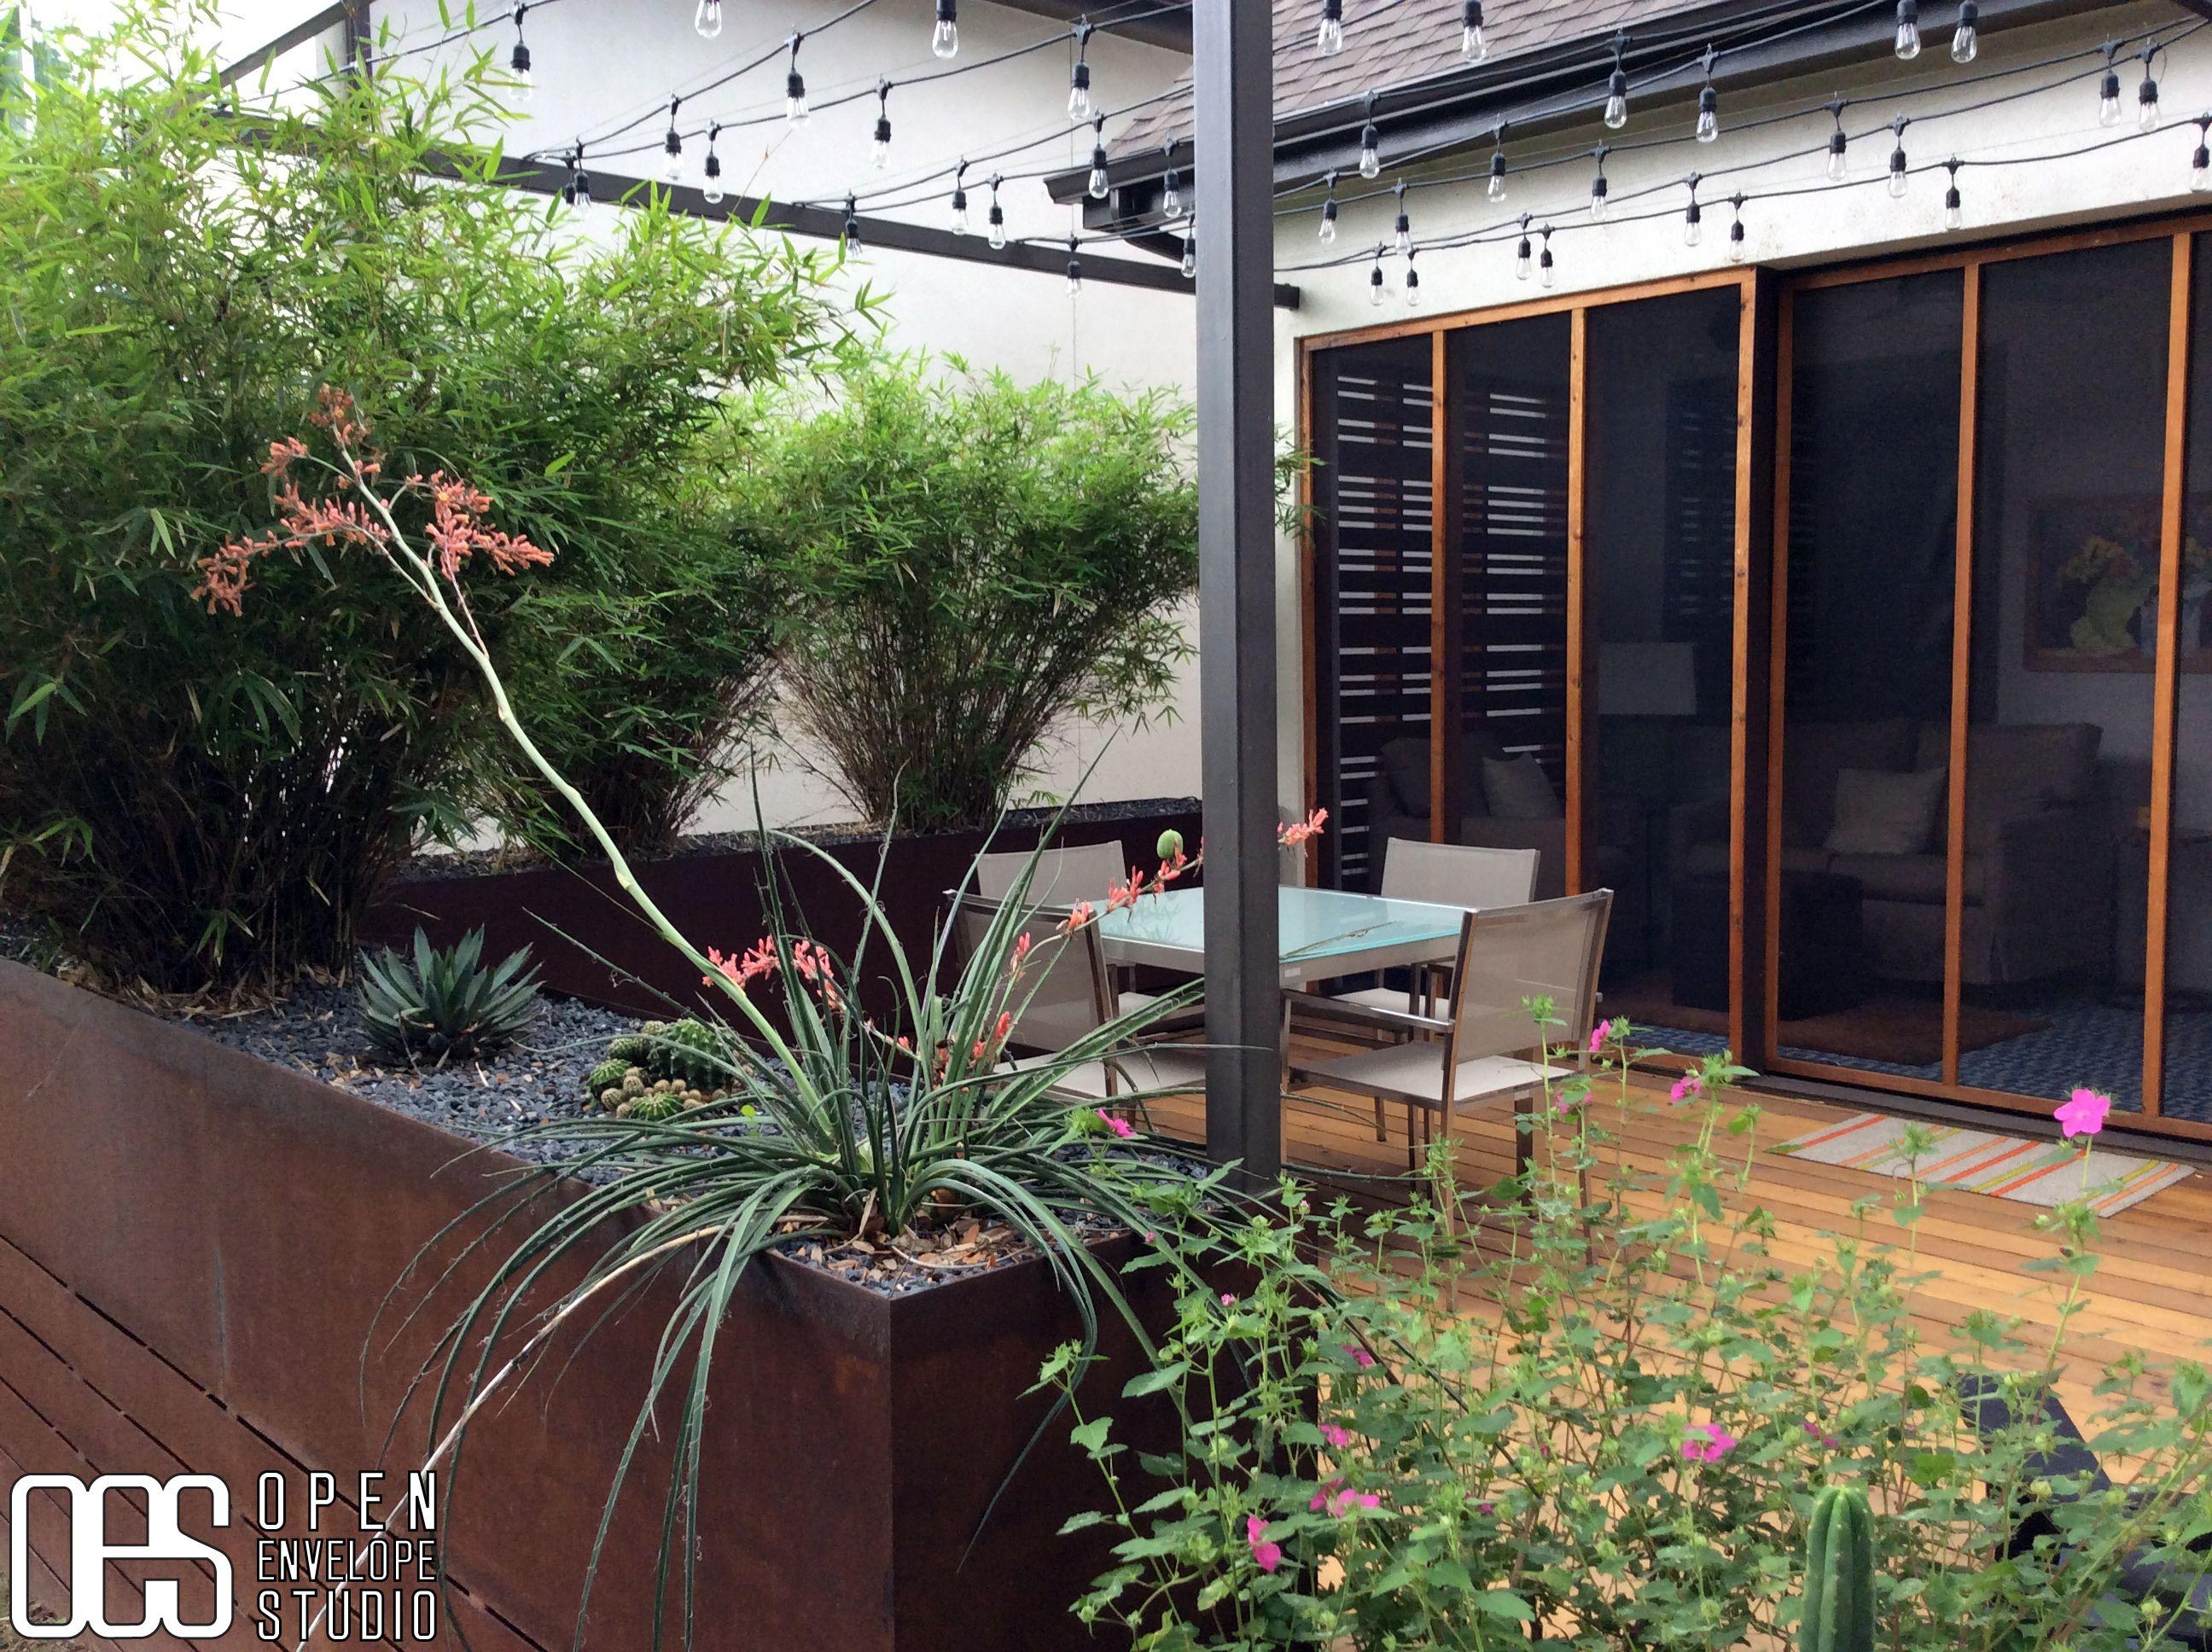 Open Envelope Studio|cedar deck with steel planters framed